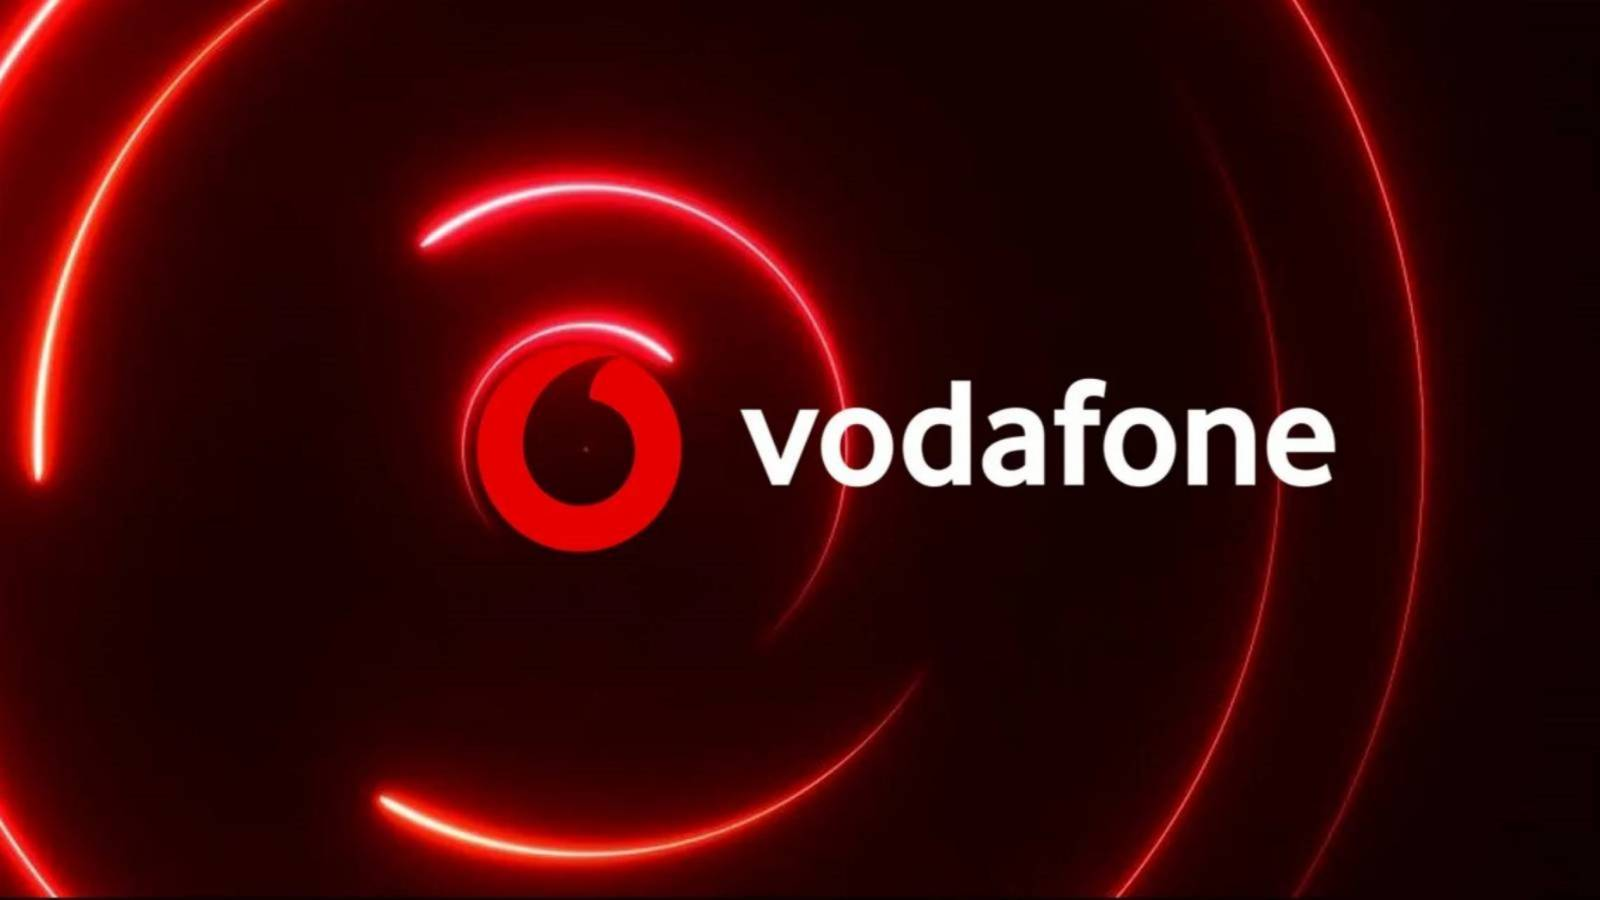 Vodafone antivirale